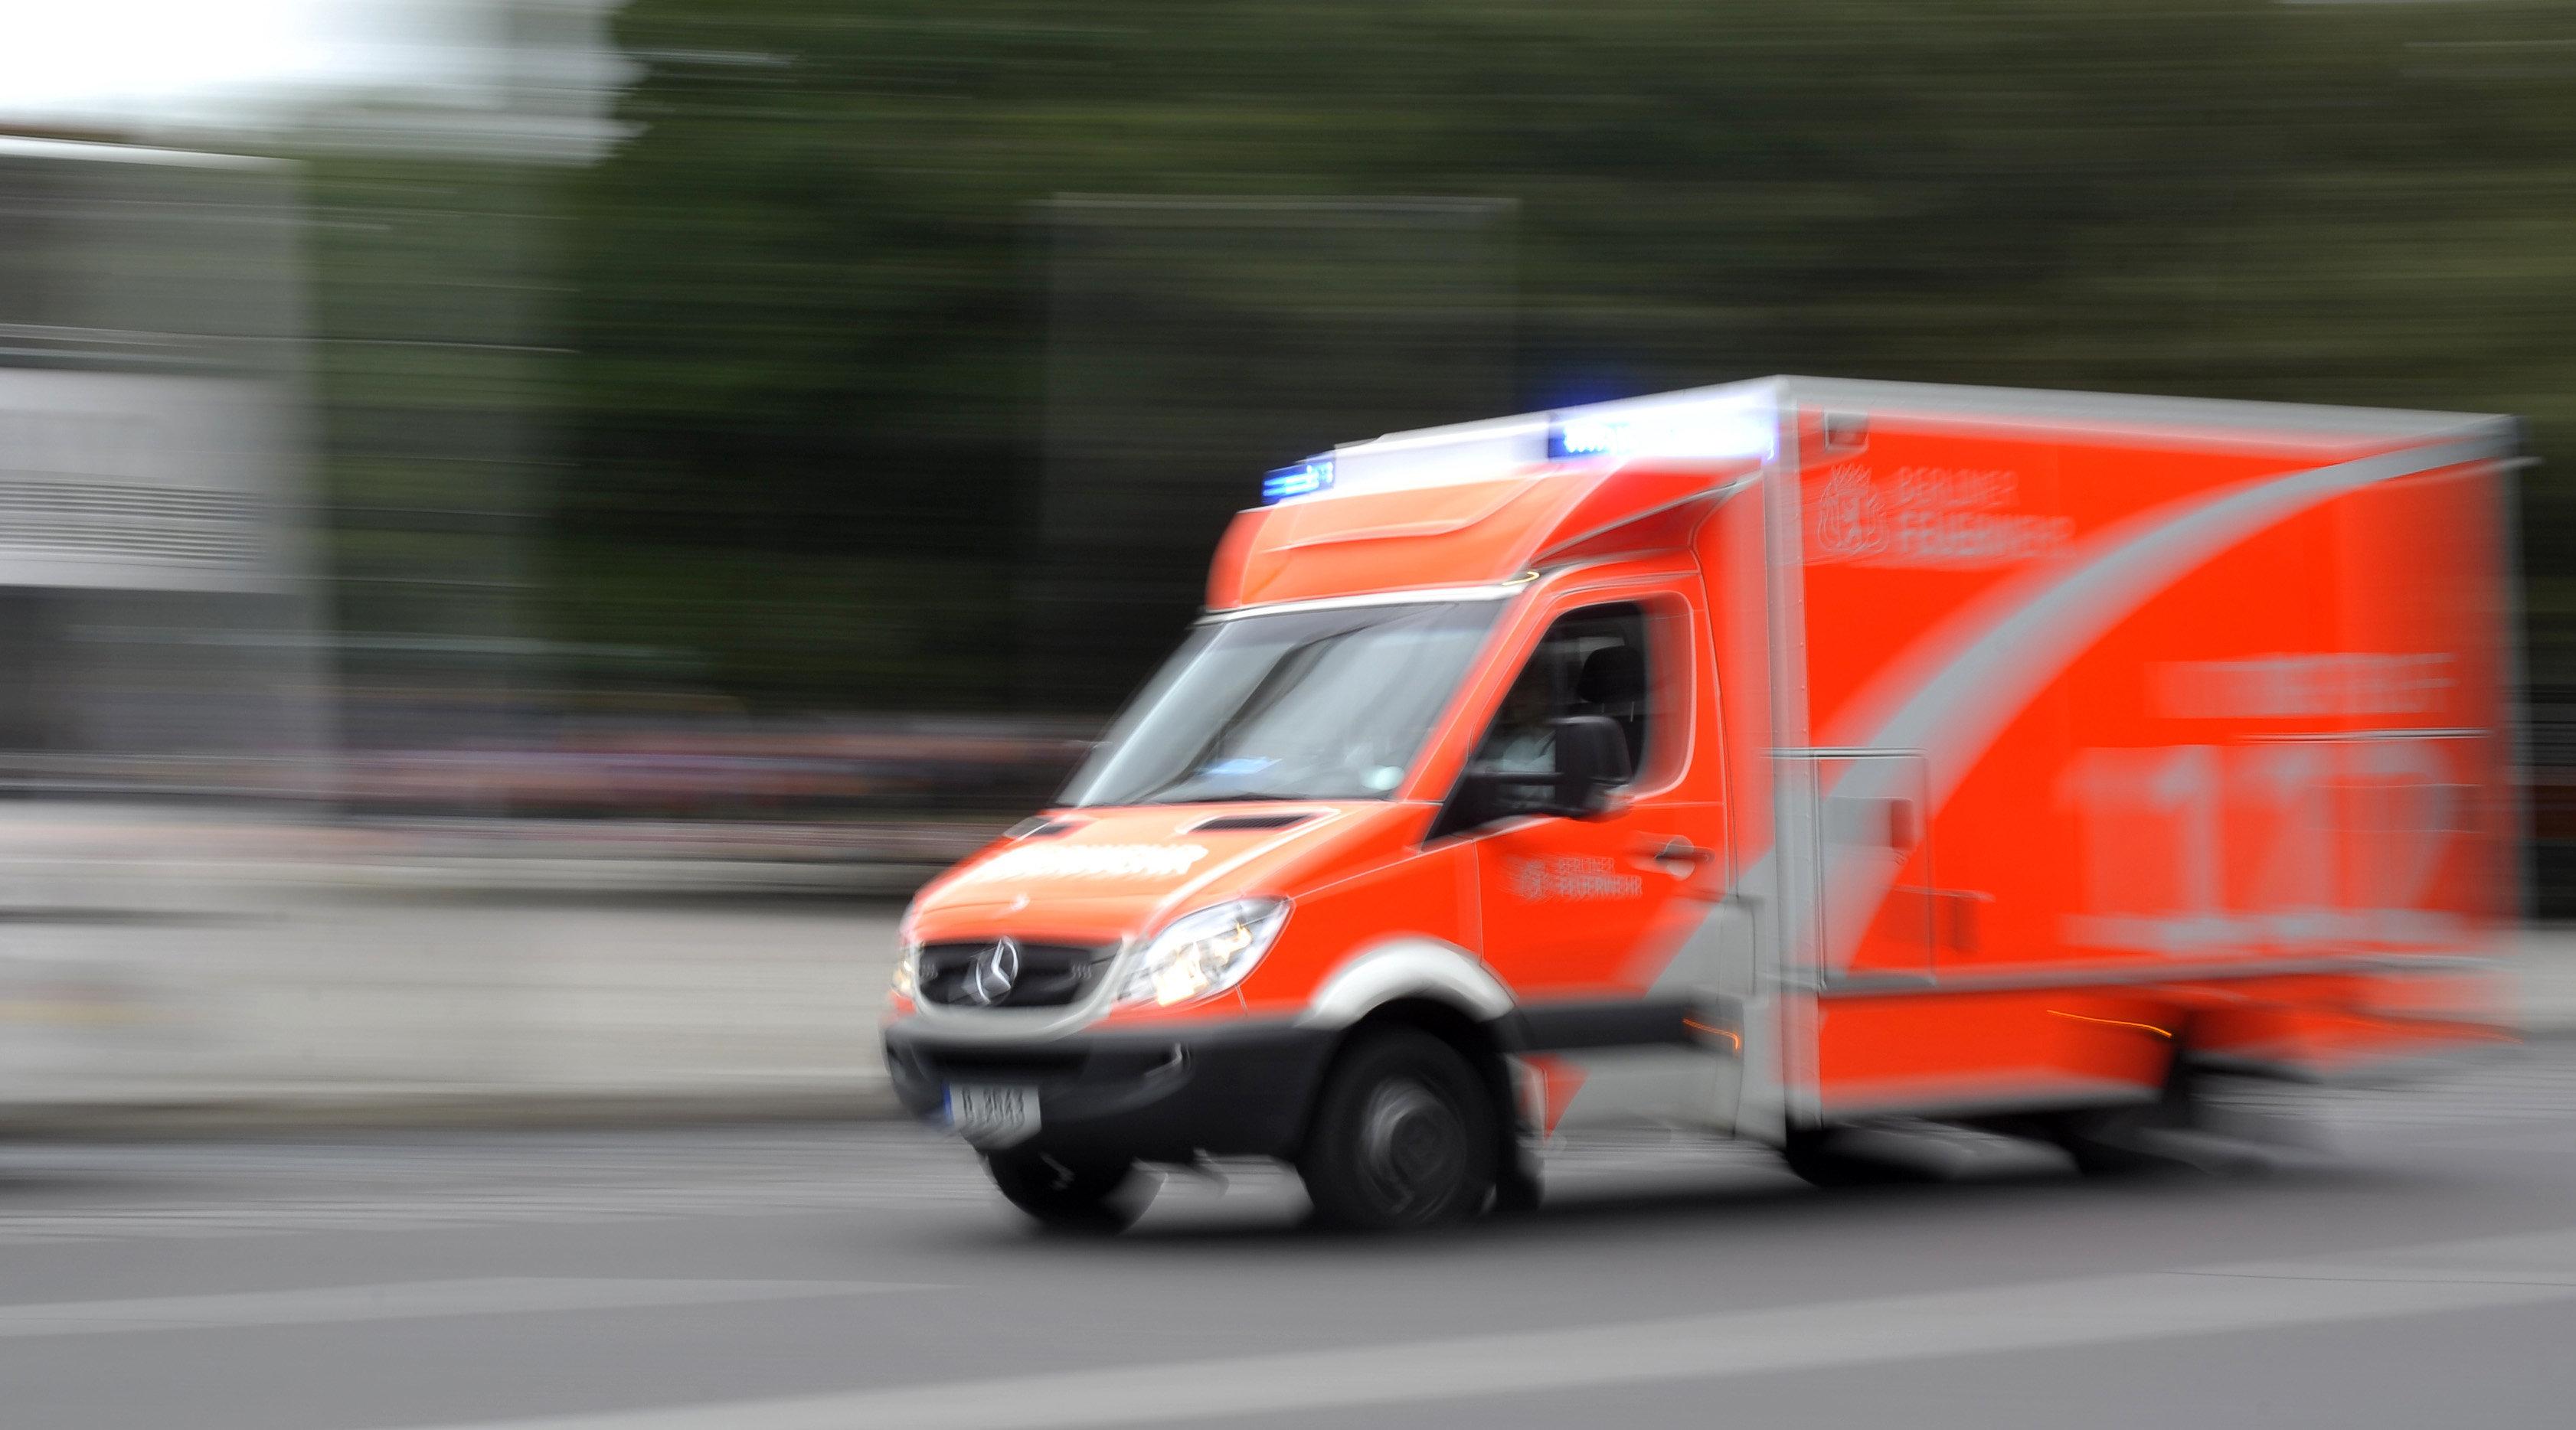 Hamburg: Ladegerät explodiert – 26-Jähriger